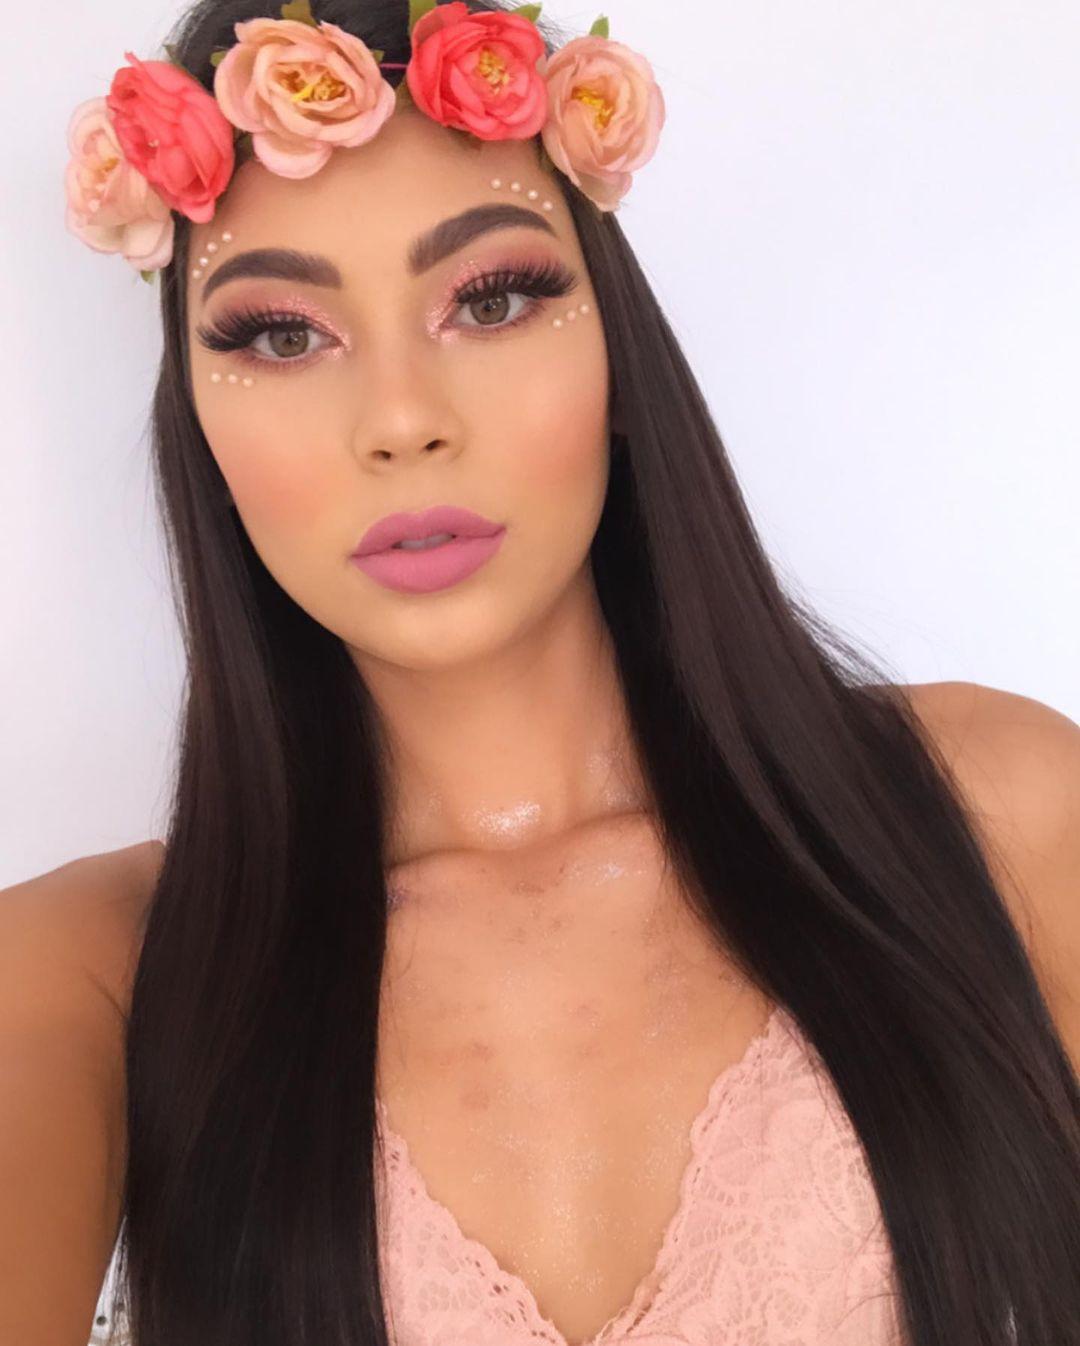 julia alves, miss cerrado goiano mundo 2019. - Página 6 Fumovs10